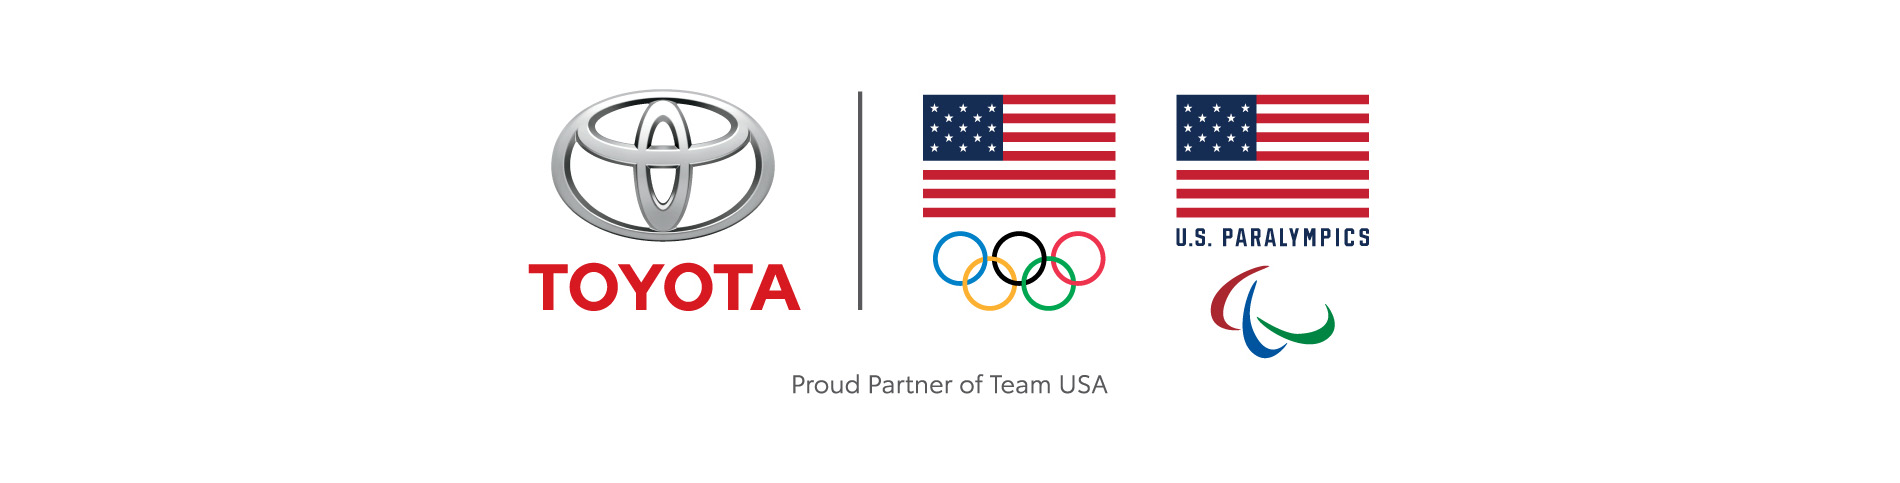 Image result for team usa and team toyota logo